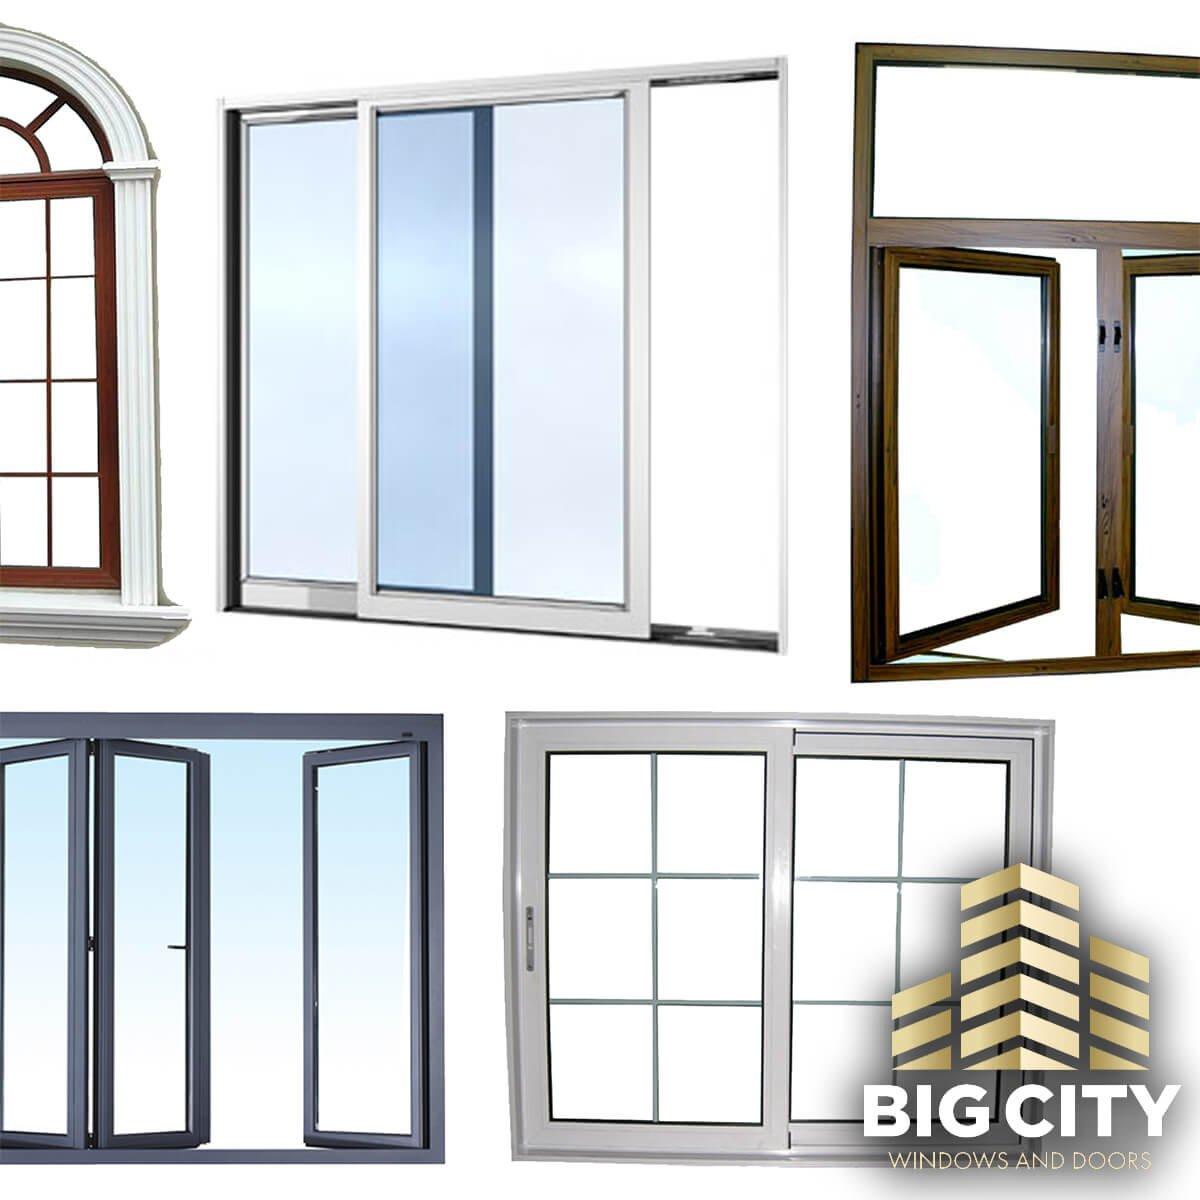 Big City Windows And Doors Bigcitywindows Twitter